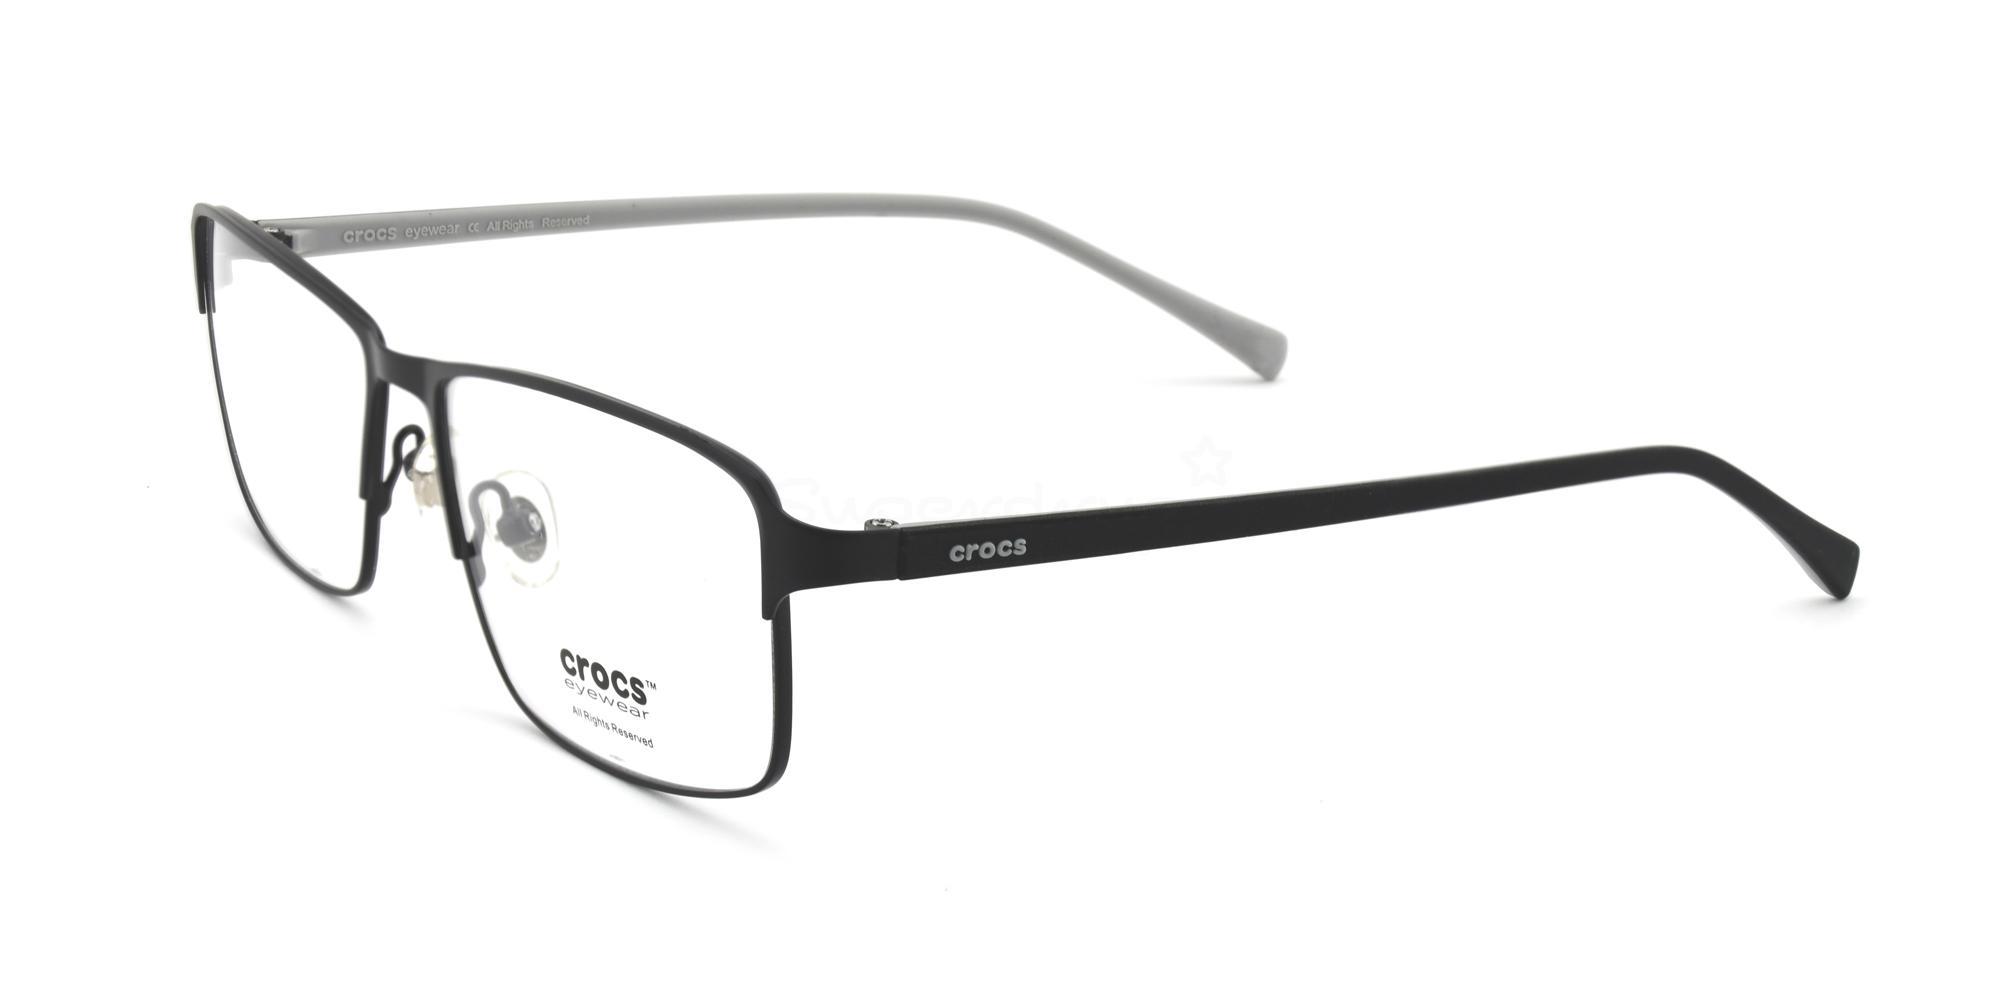 20GY CF3101 Glasses, Crocs Eyewear